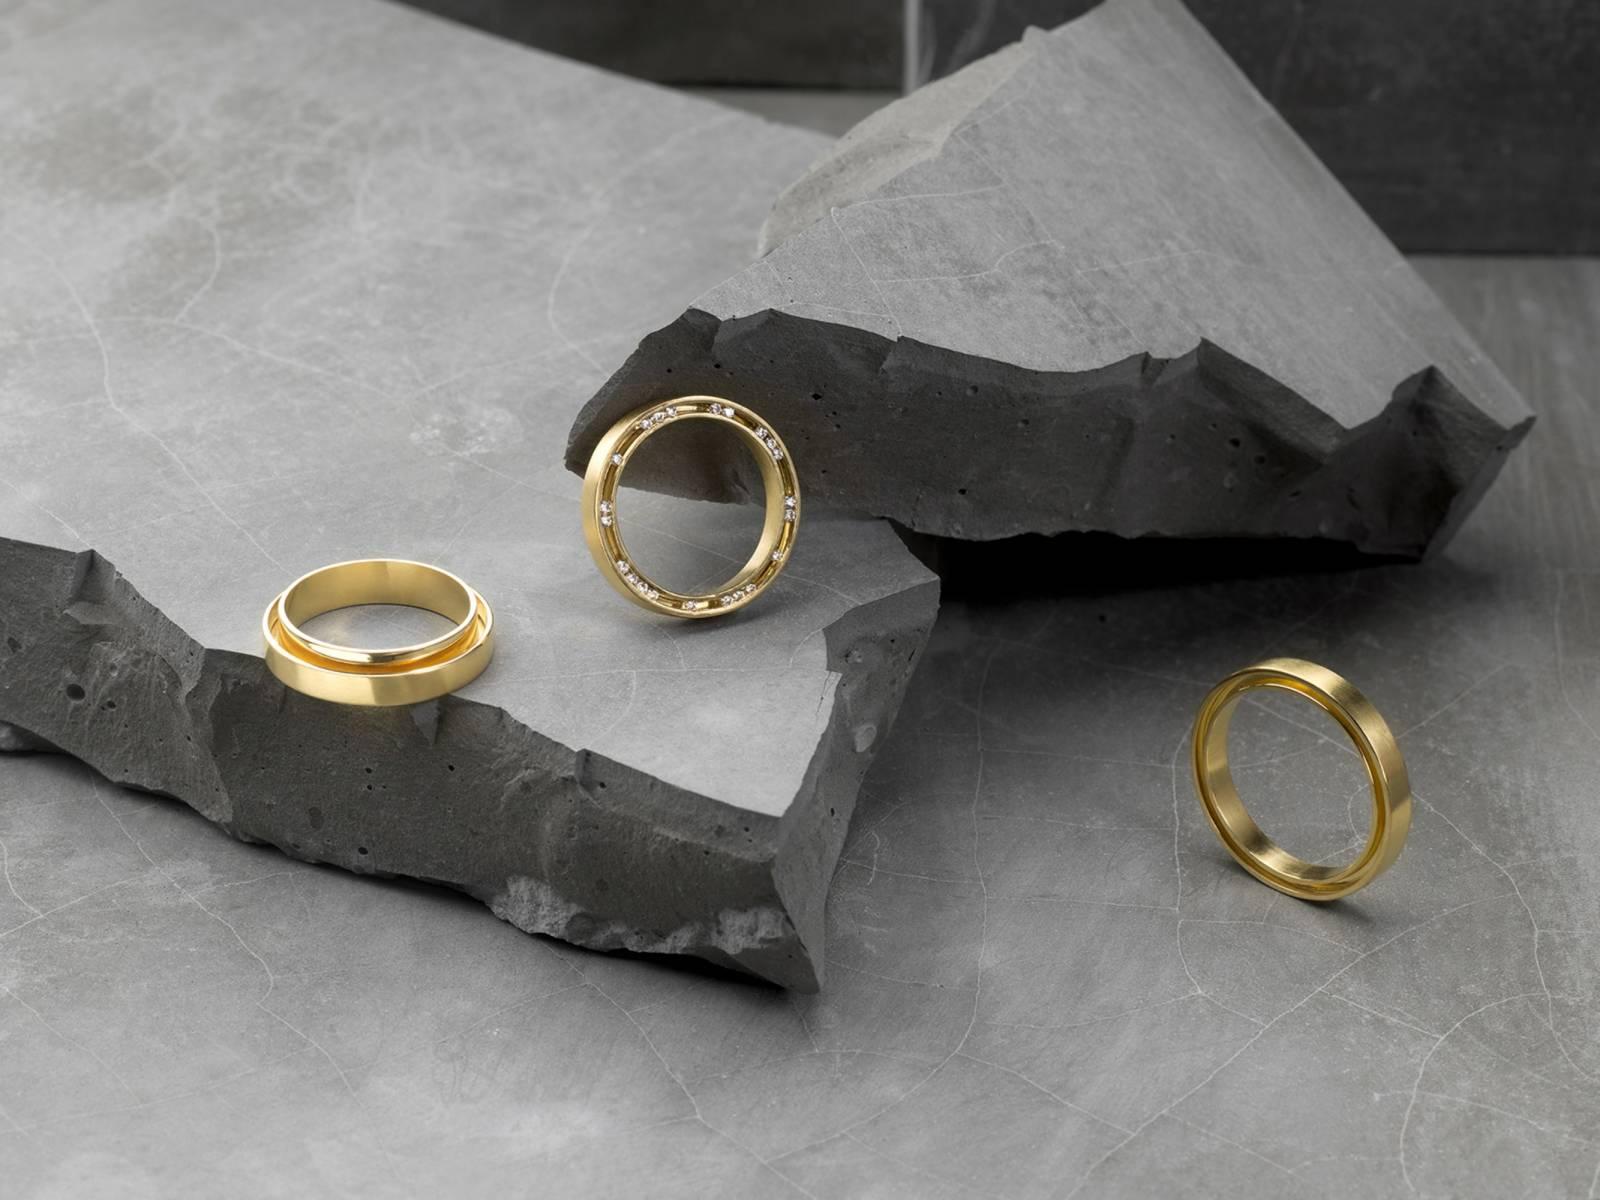 KUBINI - Juwelen - Fotograaf Filip Vanzieleghe - House of Weddings (4)